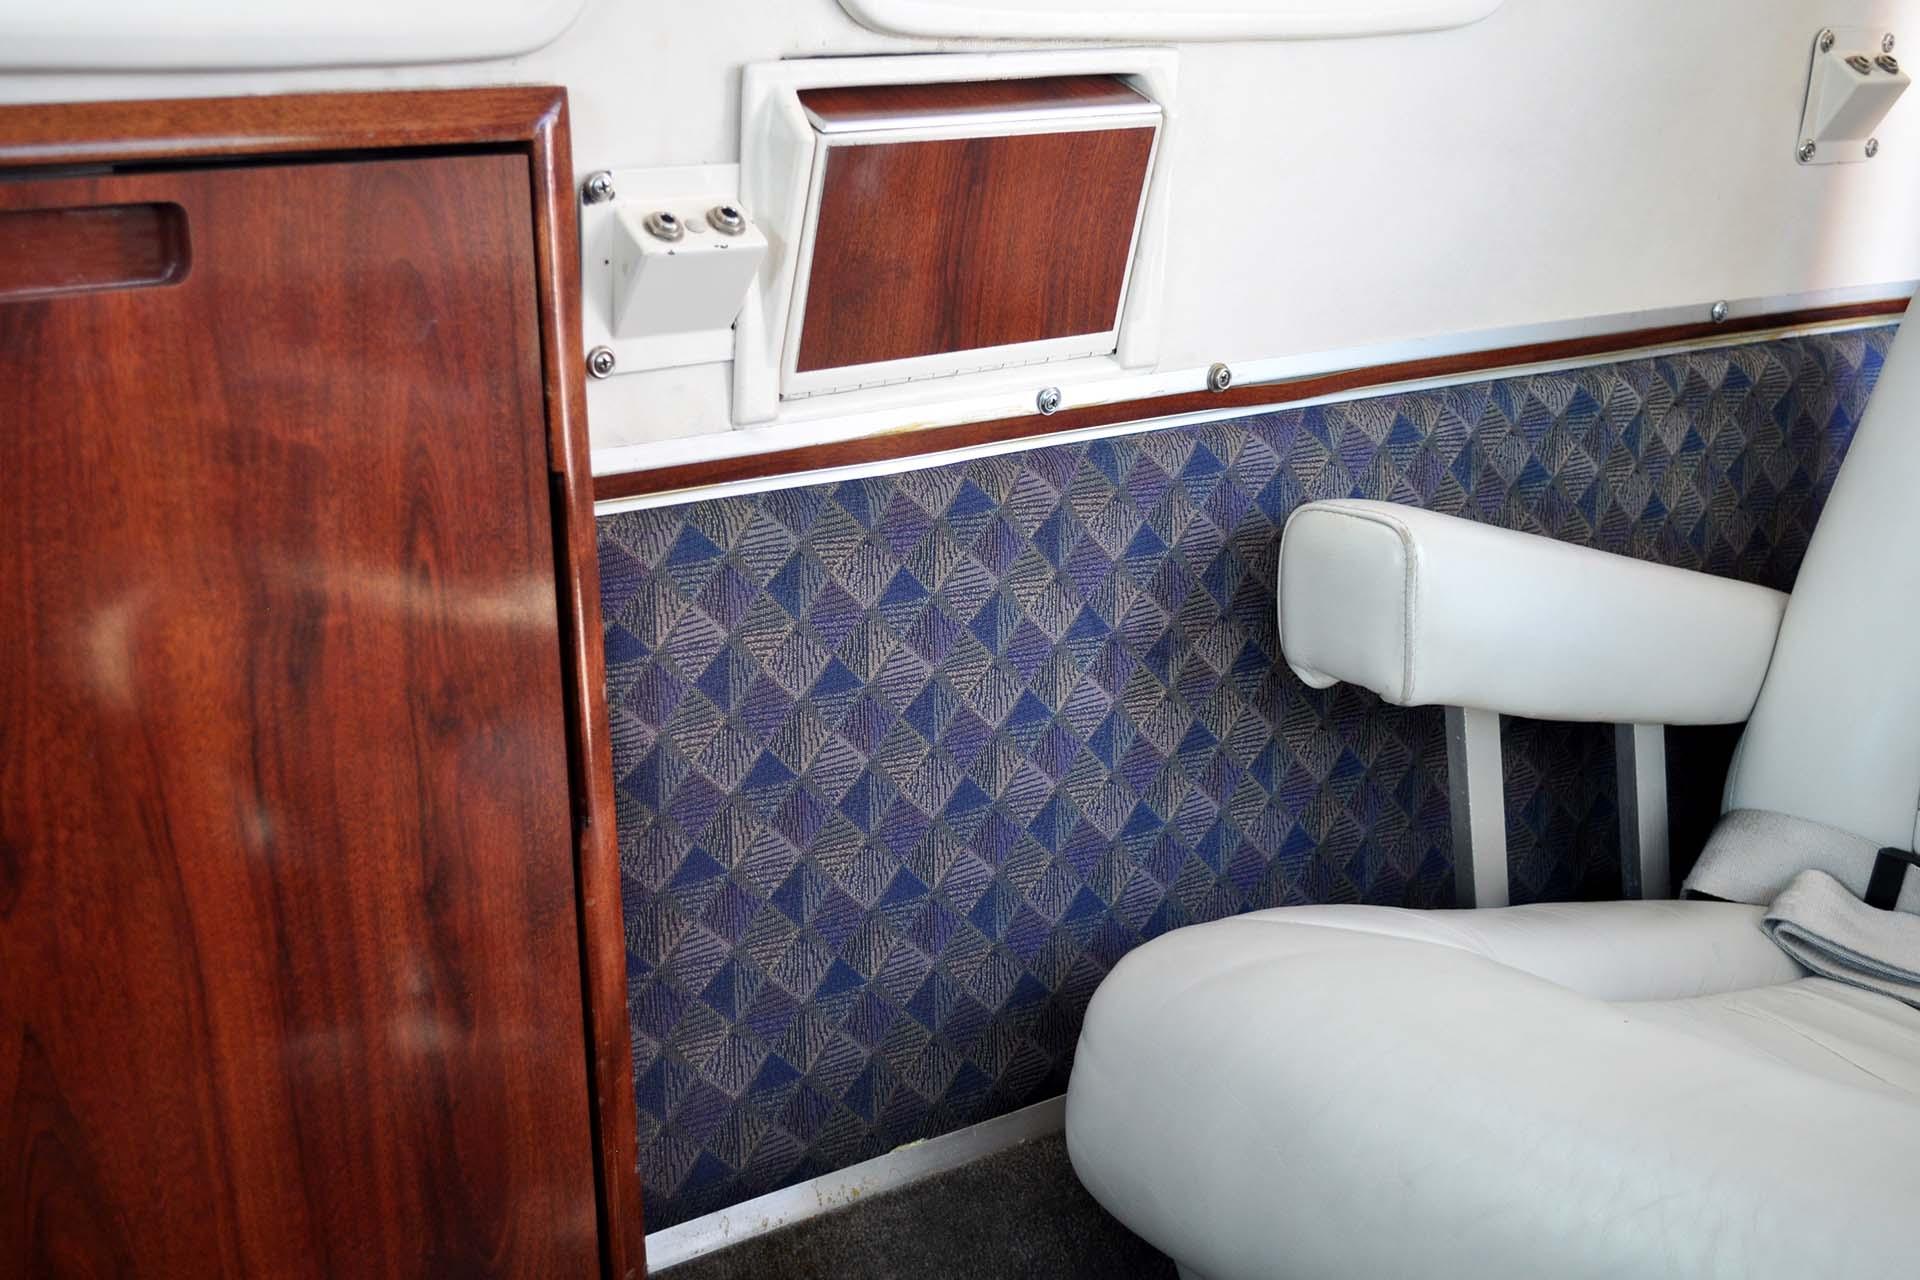 king air 90 interior refurbishment premier jet center kfcm